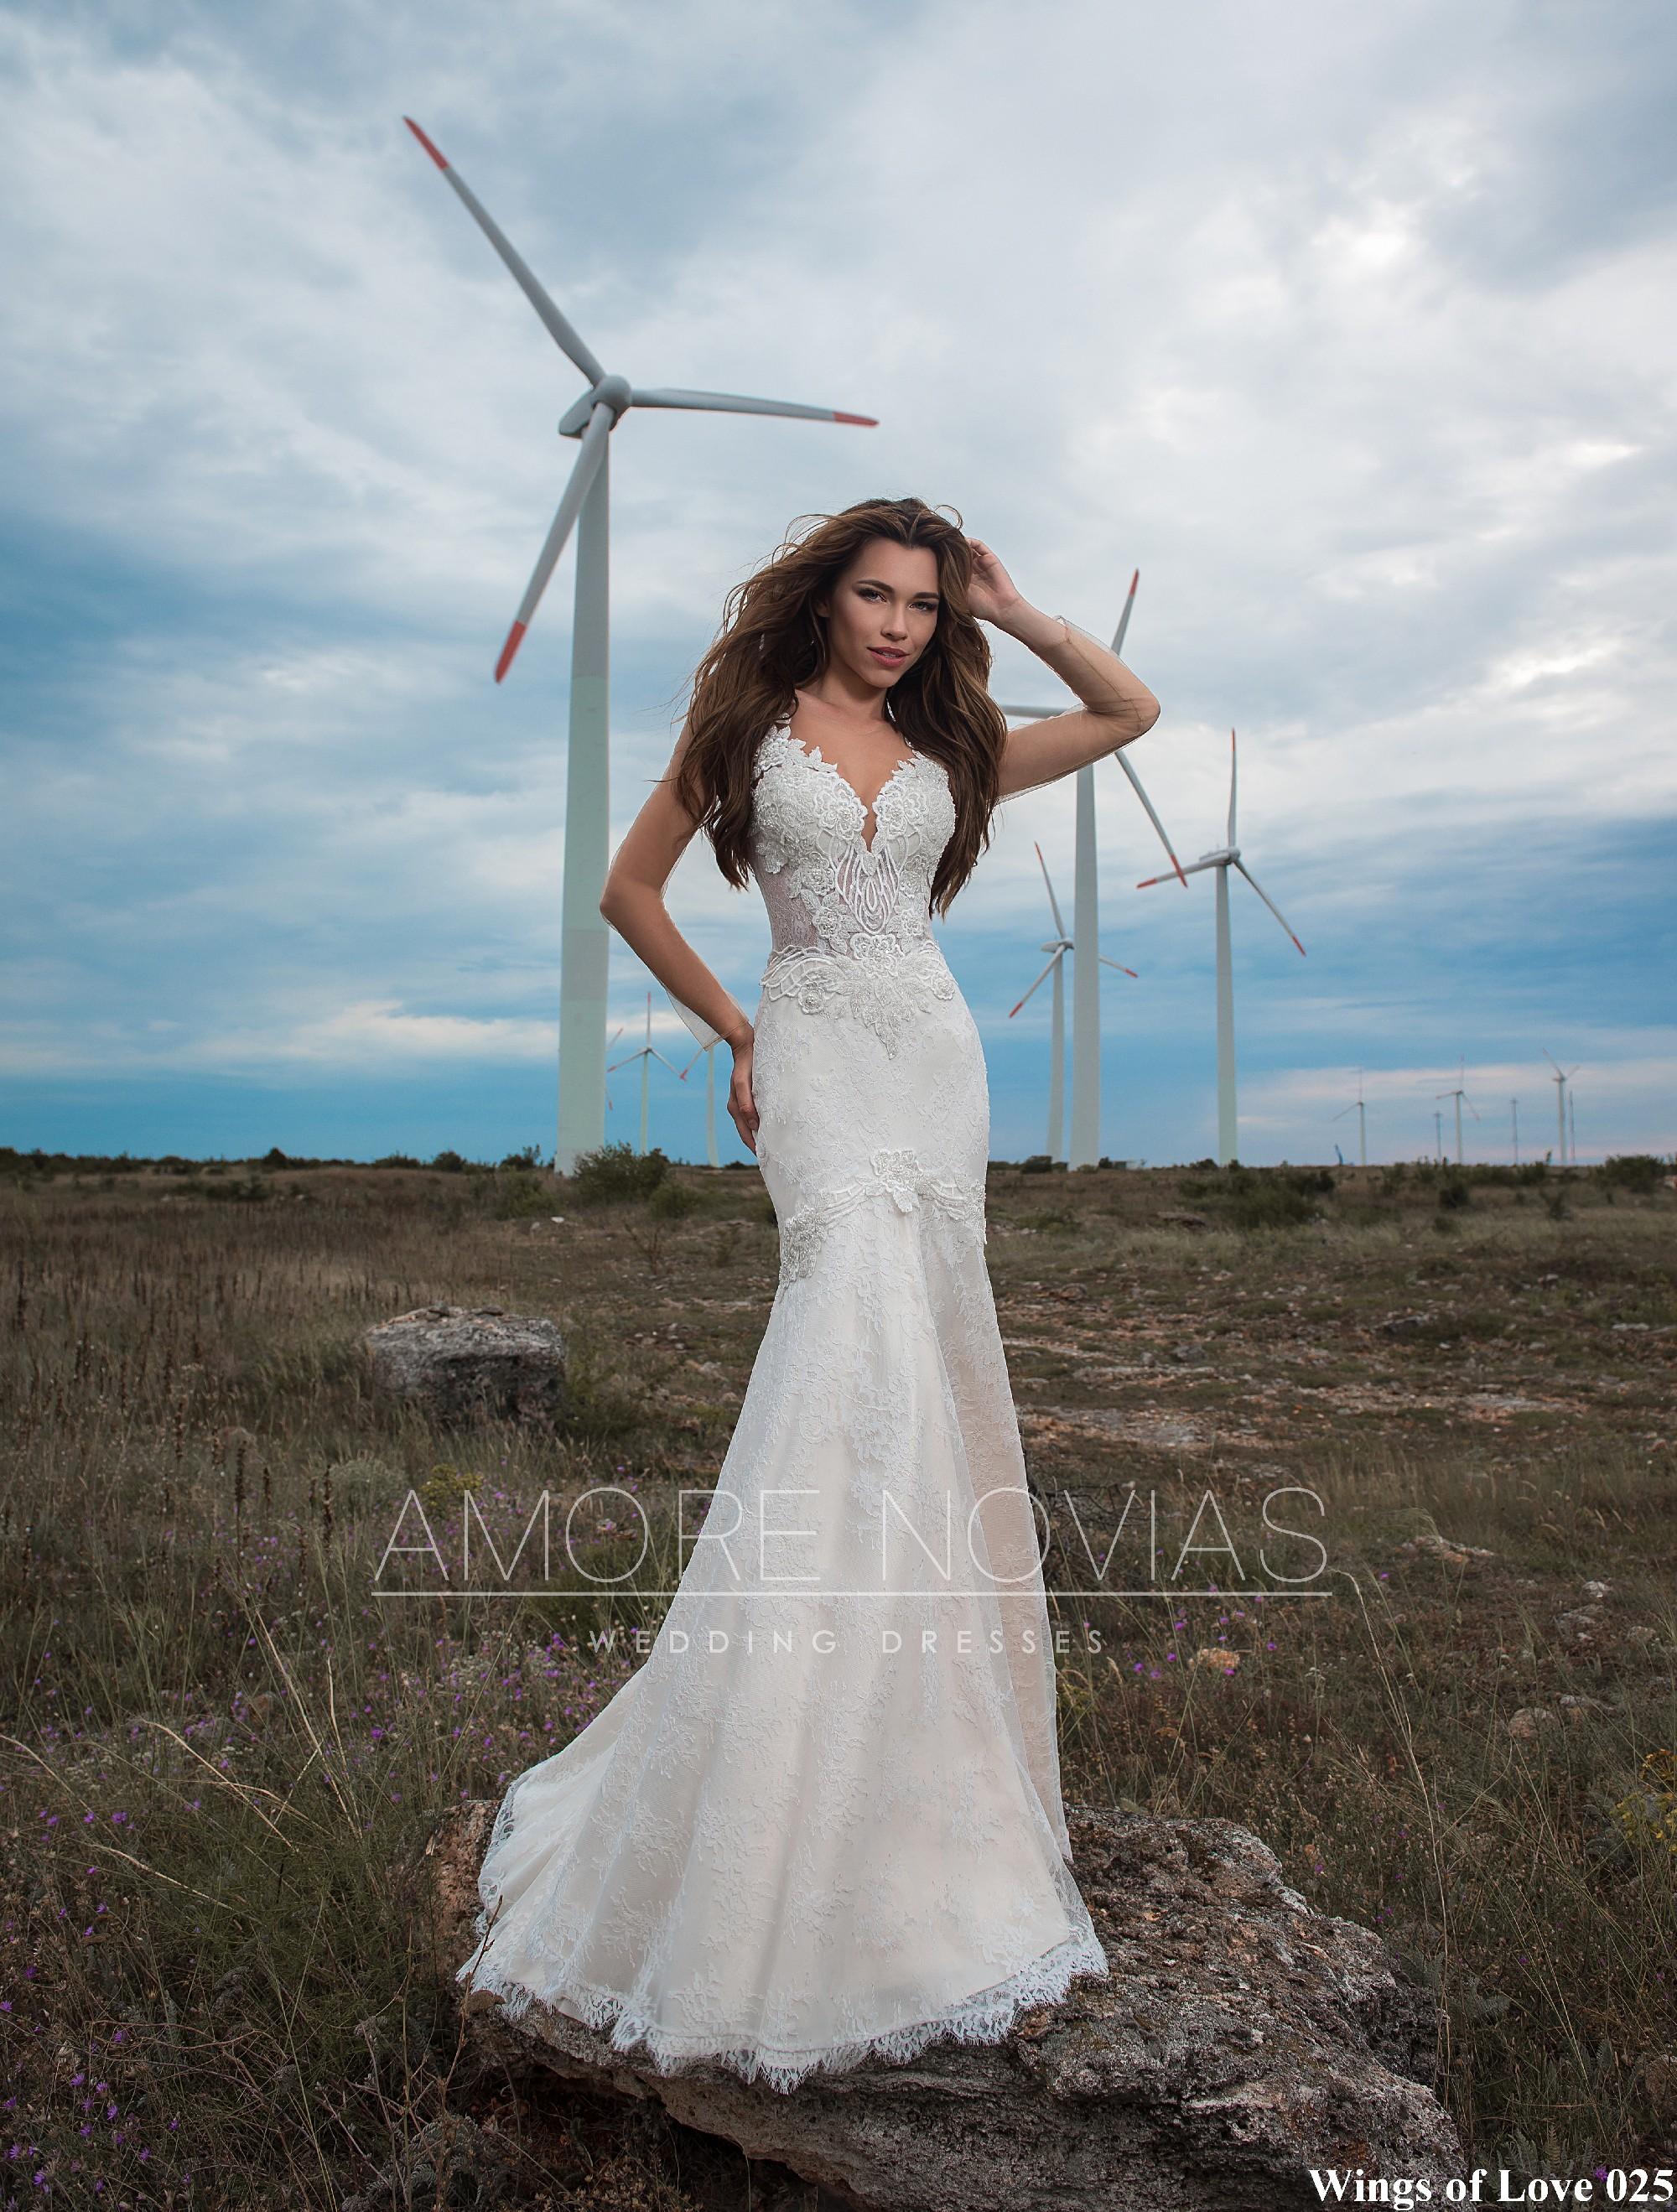 https://amore-novias.com/images/stories/virtuemart/product/lk-025-------(1).jpg